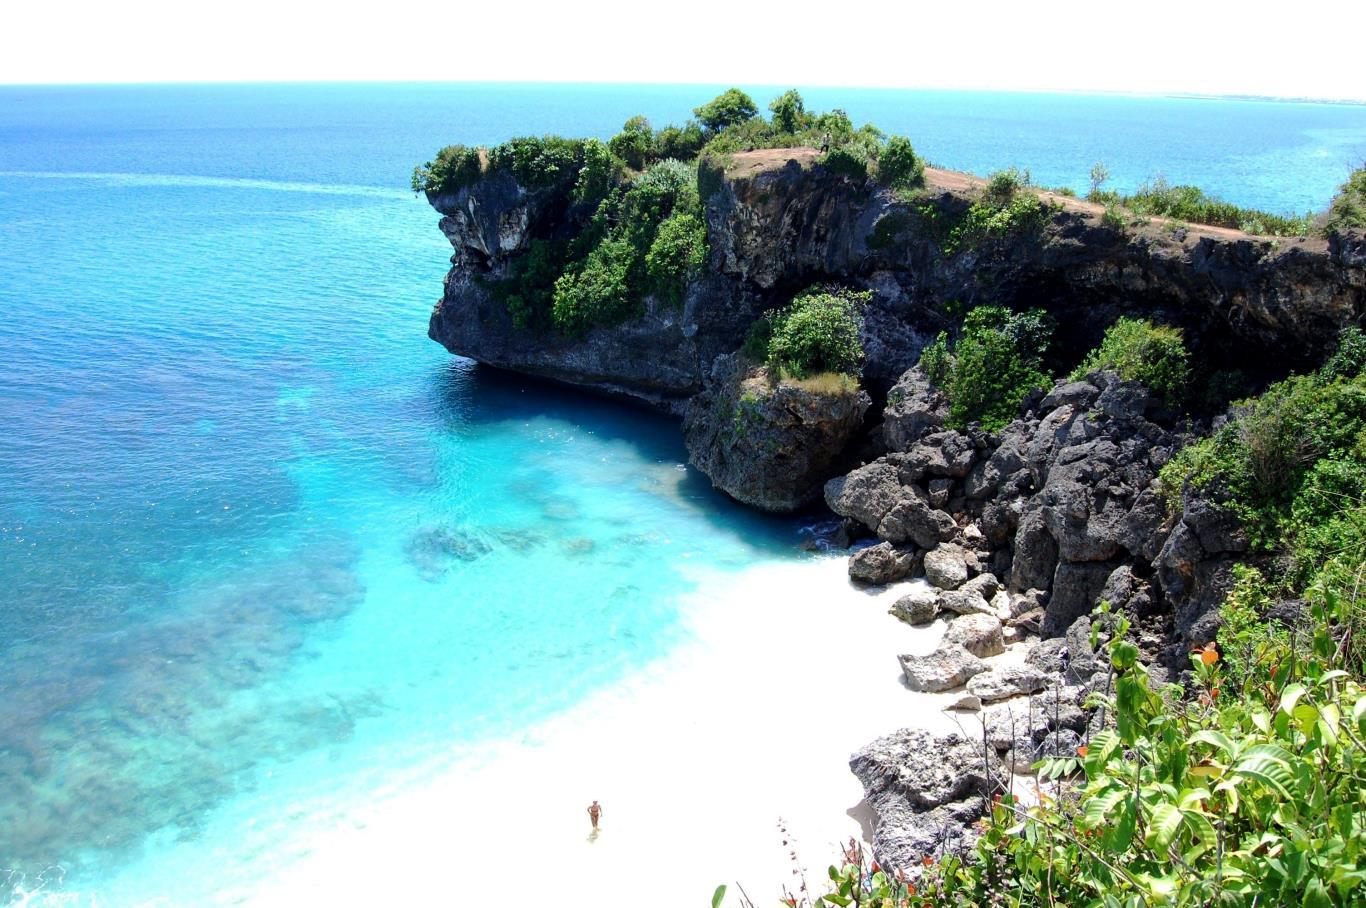 Bali - Điểm du lịch Indonesia hấp dẫn